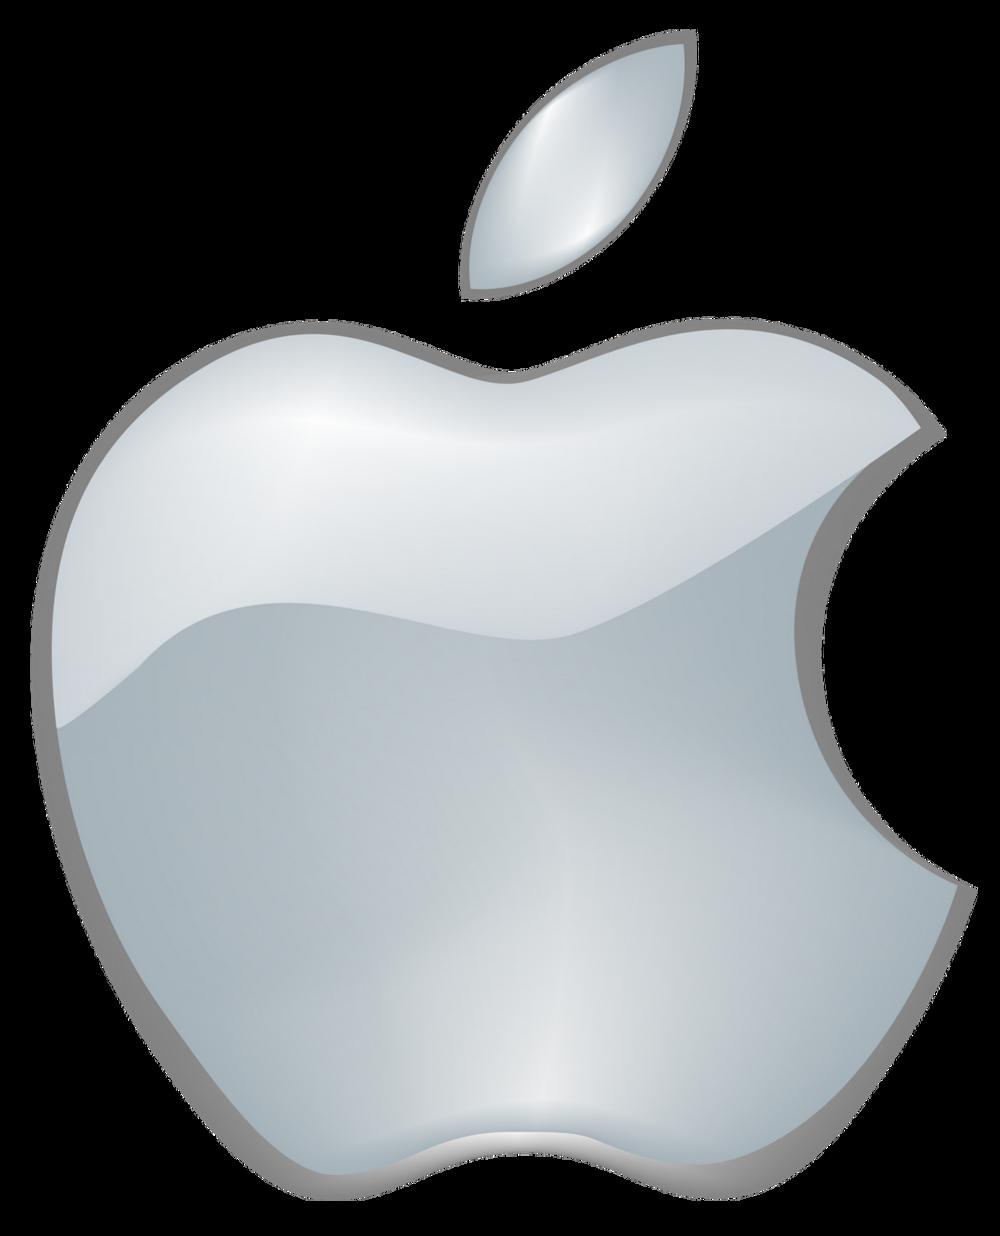 Apple-Logo-Png-Download.png